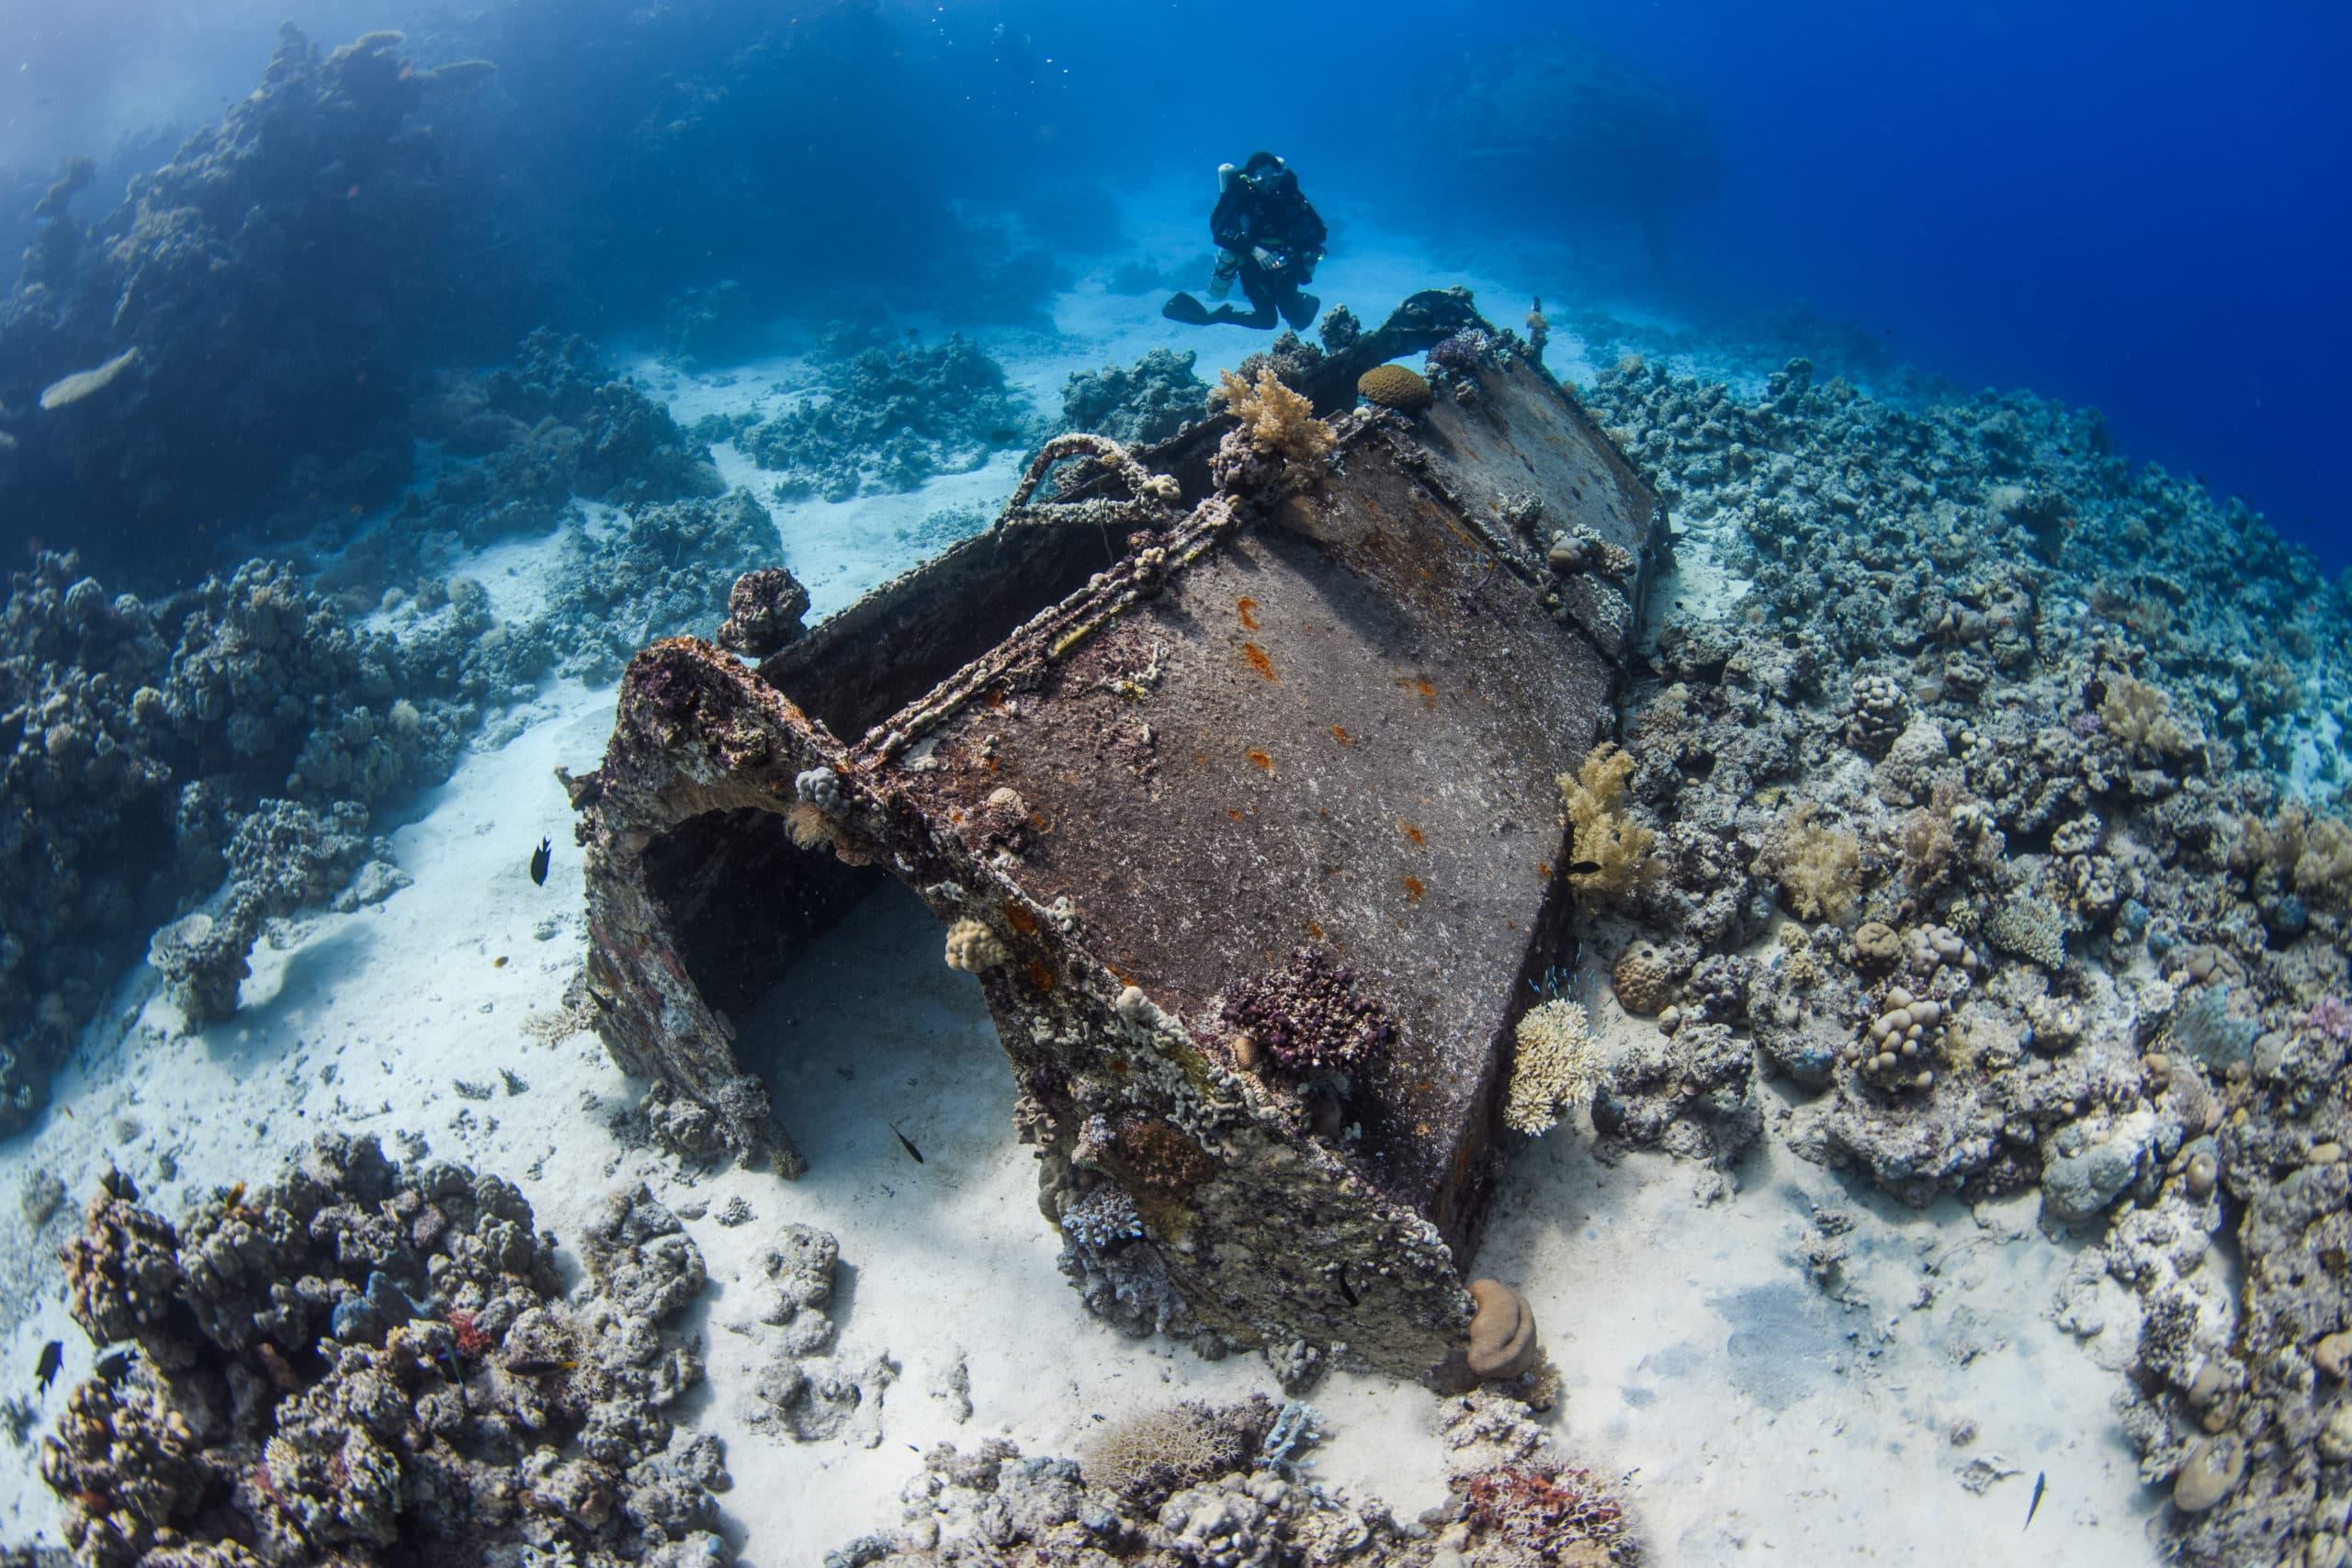 Umbria wreck scuba dive